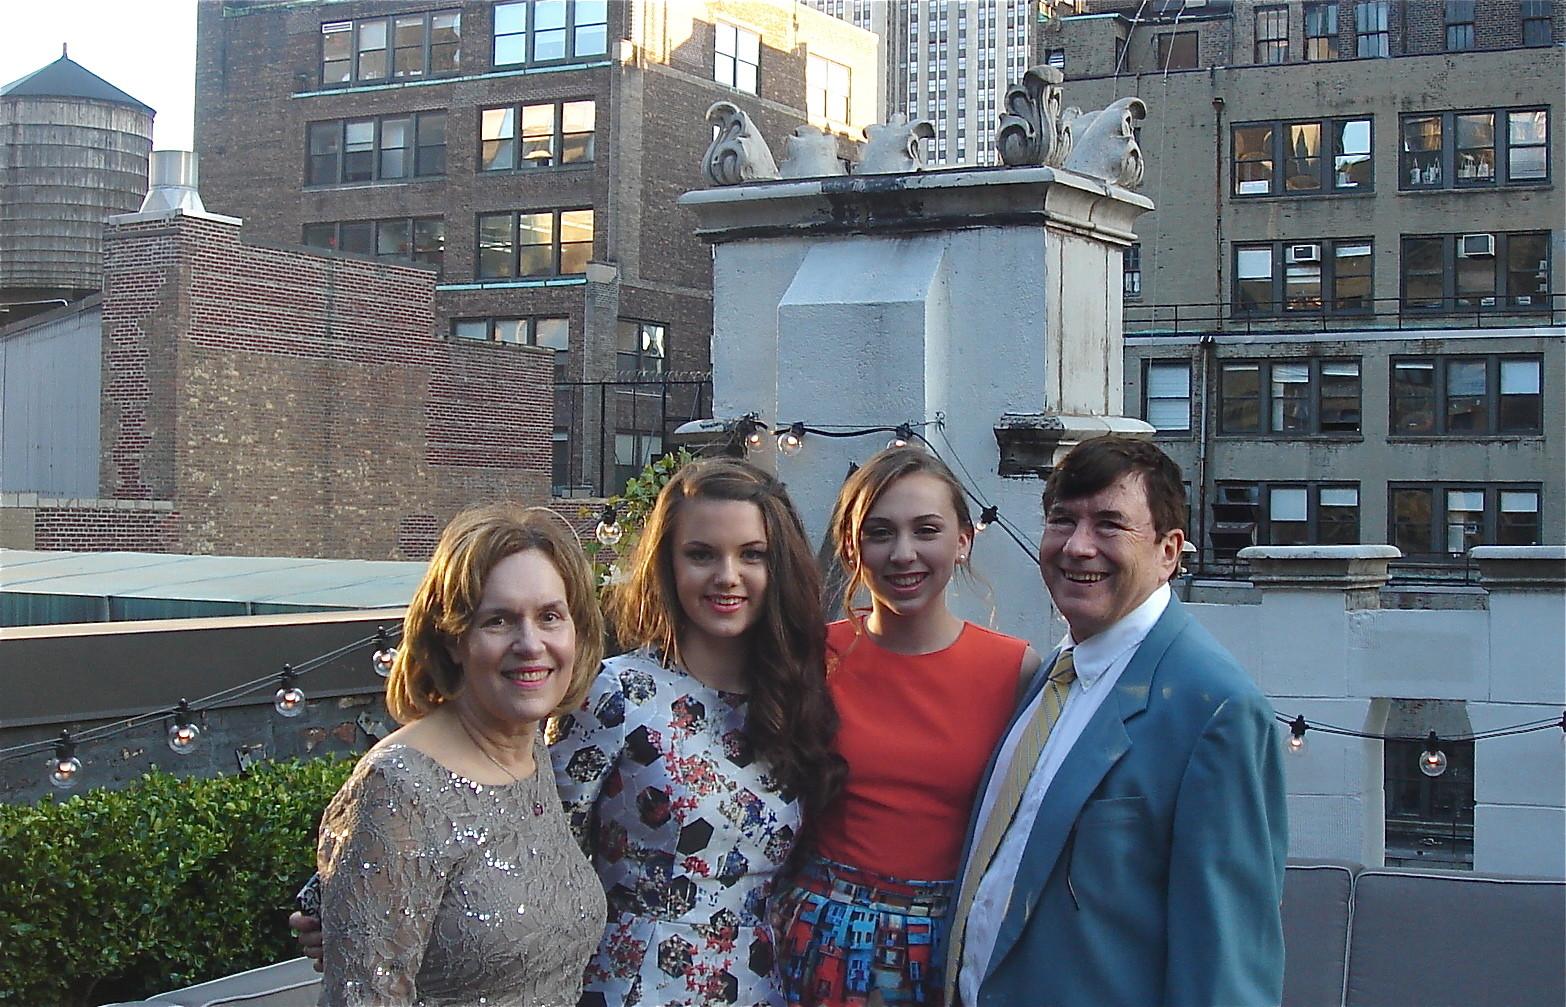 Lorraine, Kate, Gabby, and John